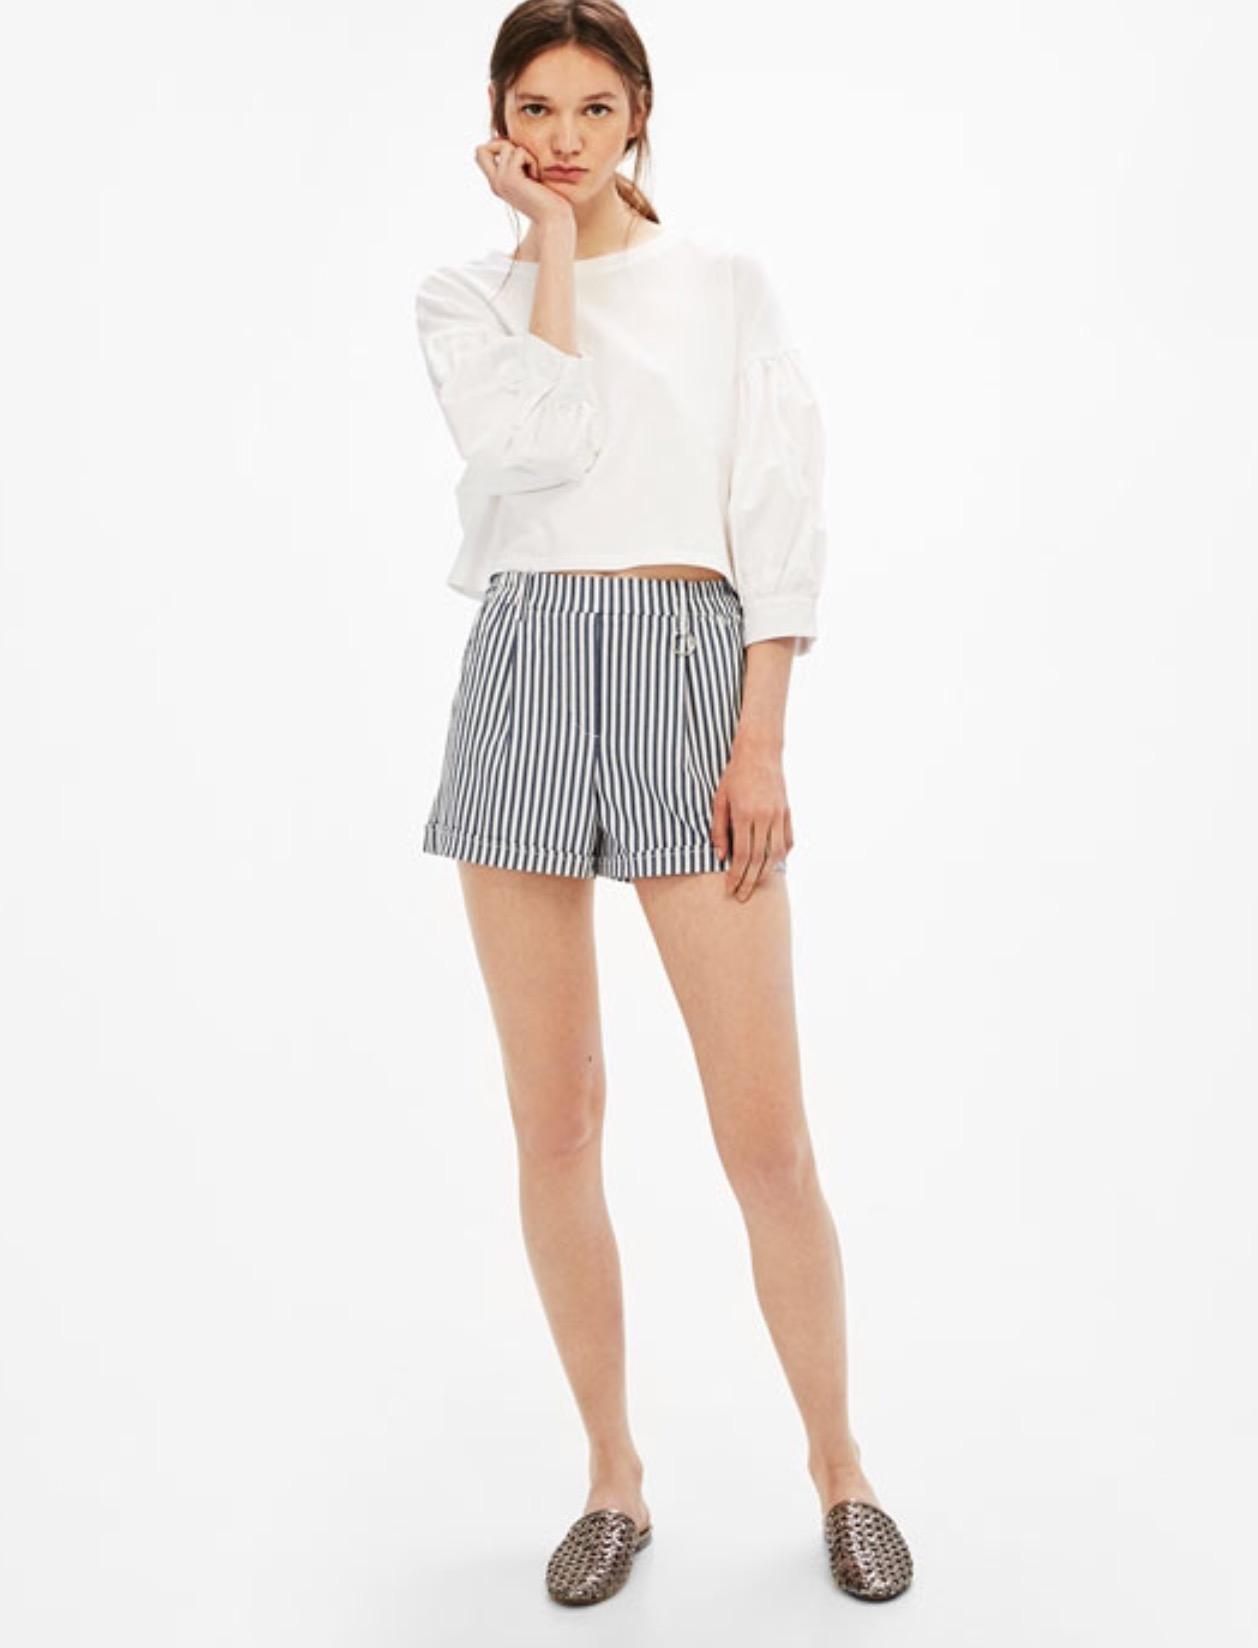 Bershka Tailored Bermuda shorts with metallic ring